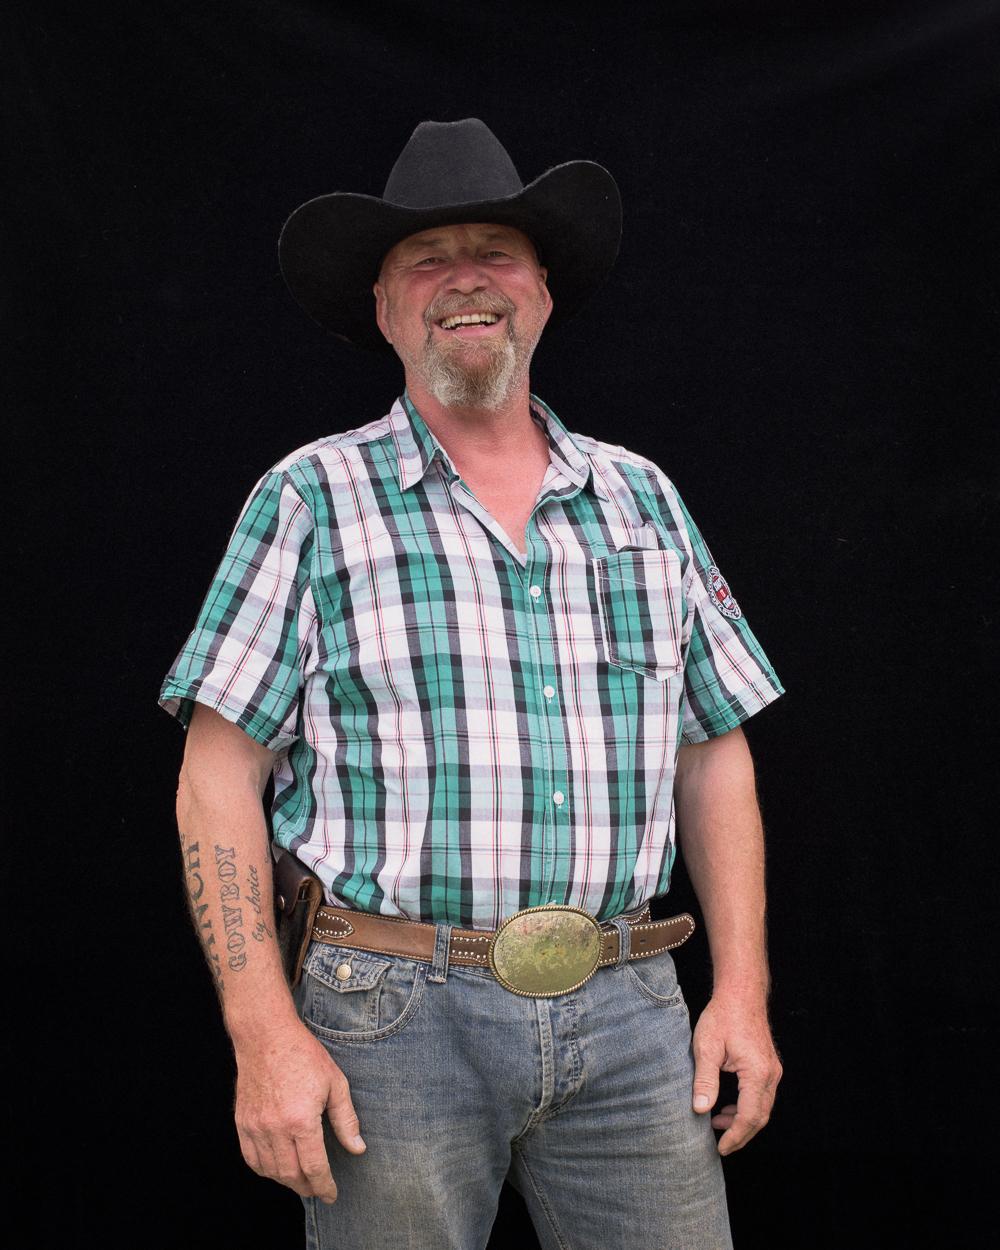 cowboys-9053-Edit.jpg